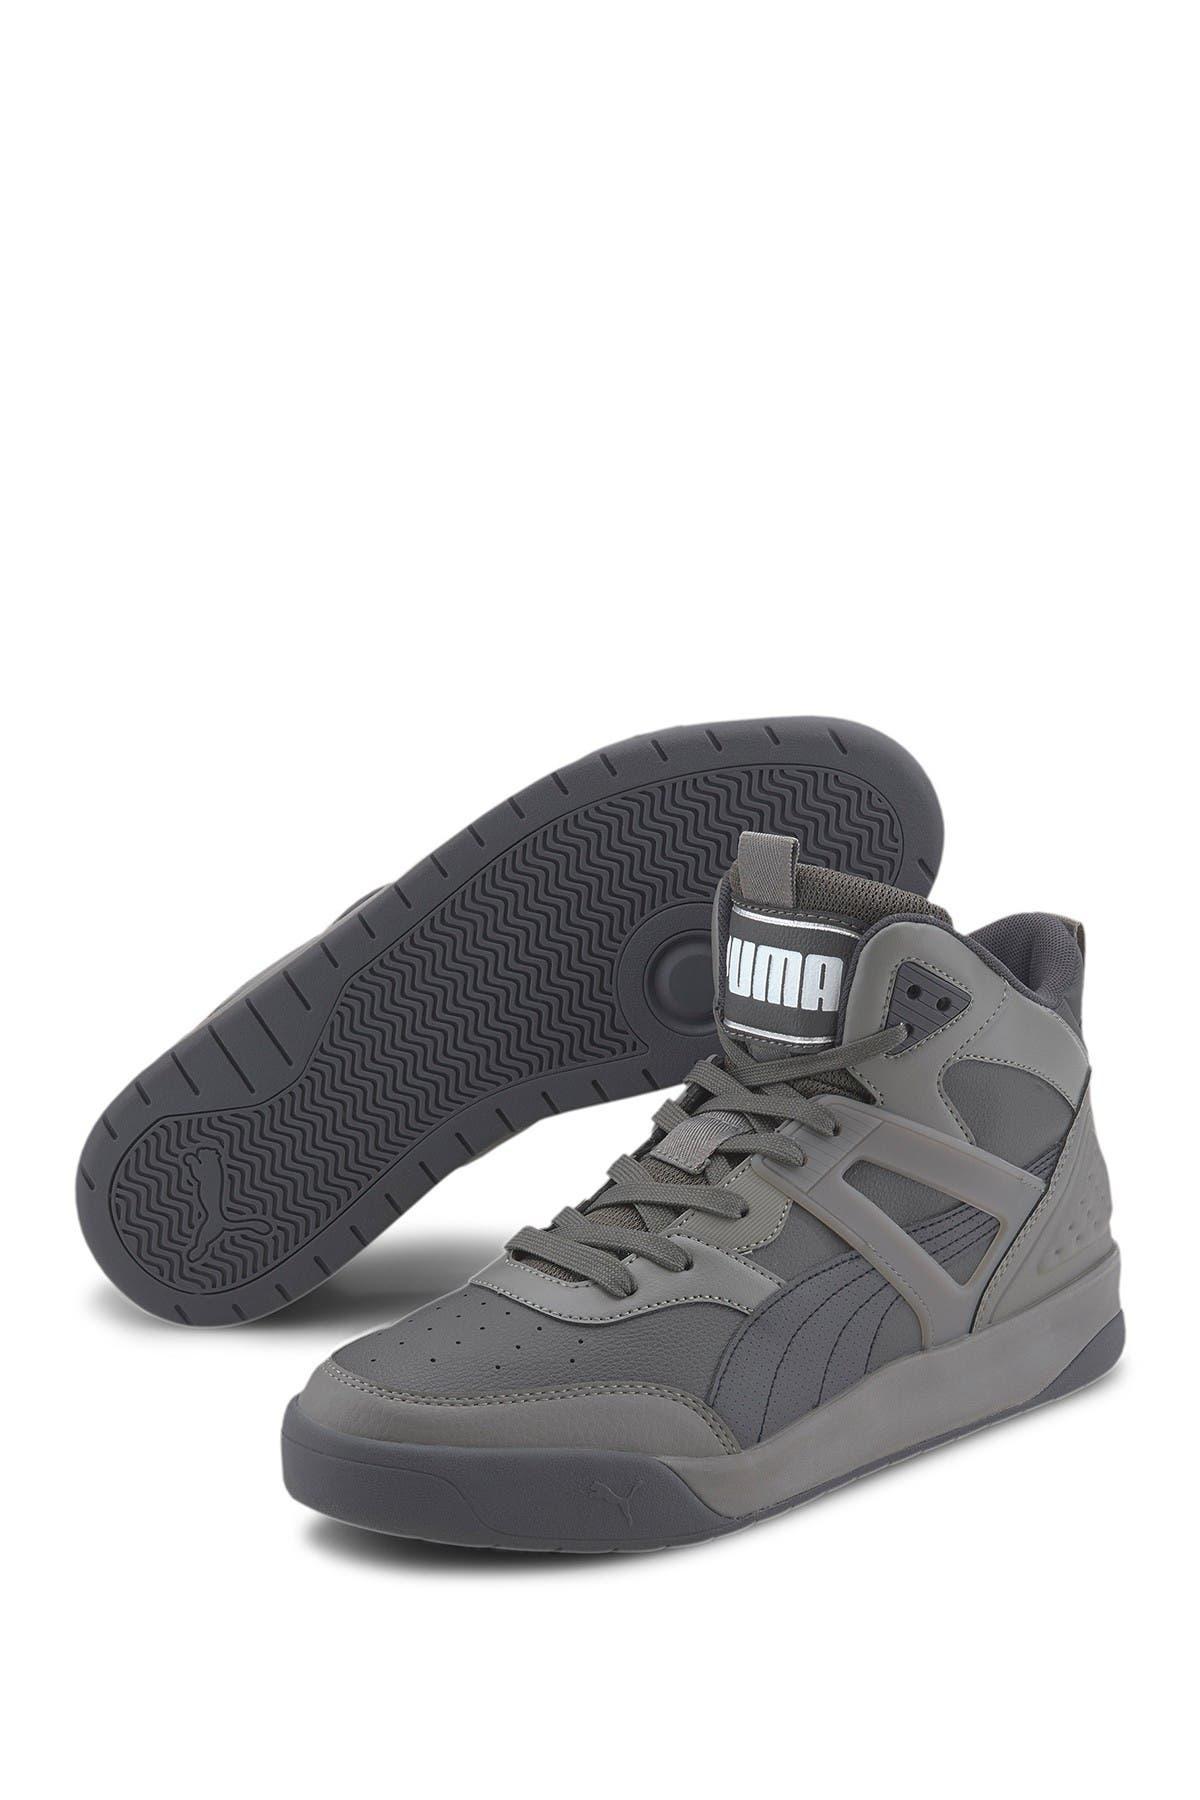 Image of PUMA Backcourt Mid Sneaker